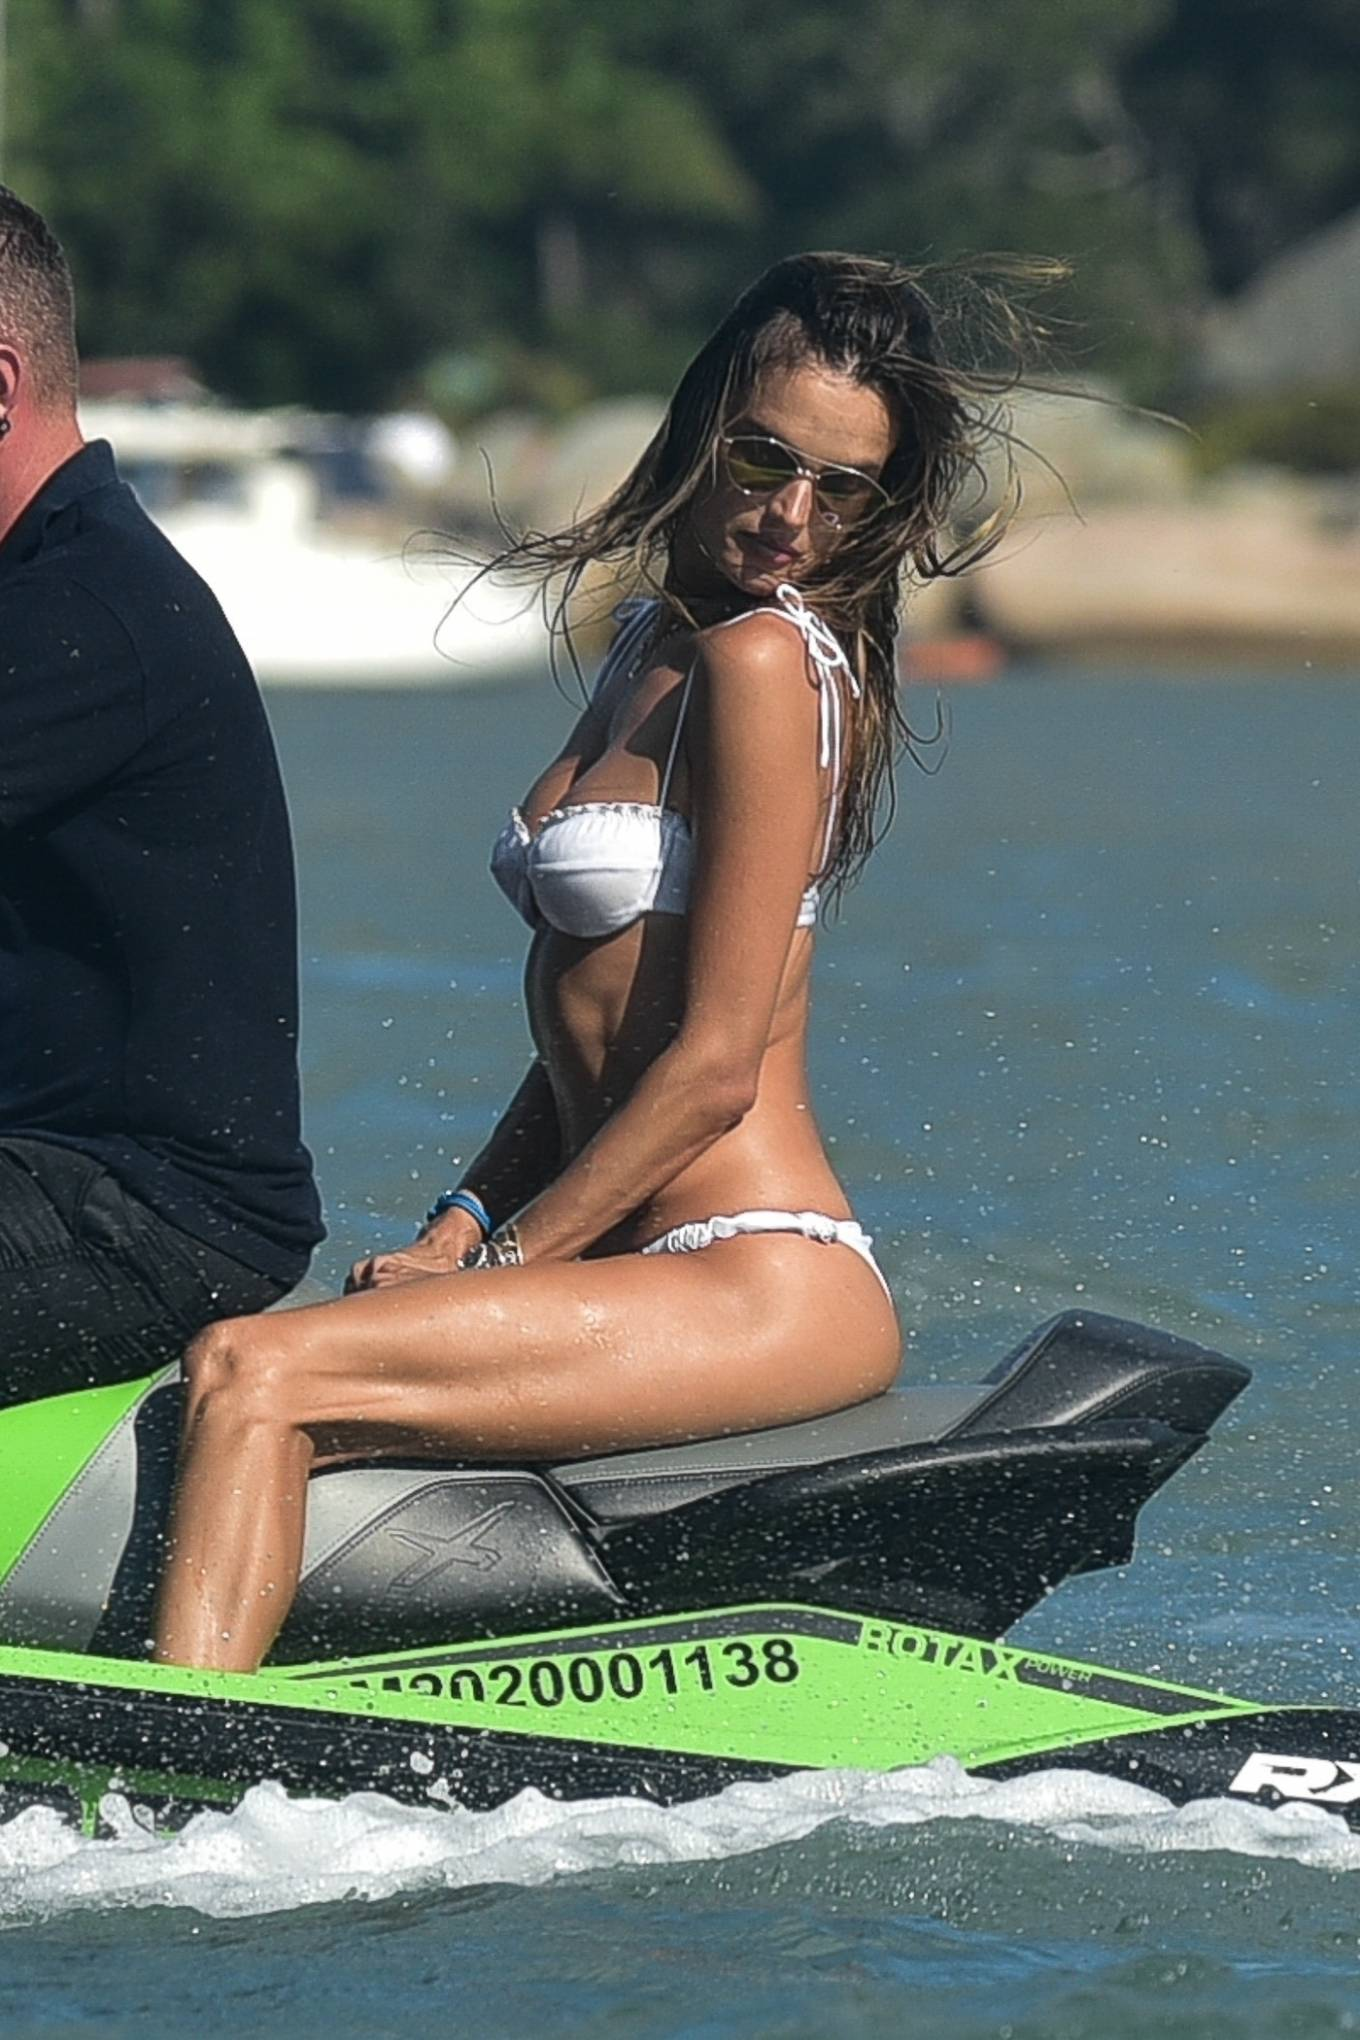 Alessandra Ambrosio - Pictured while jet ski riding in Florianopolis